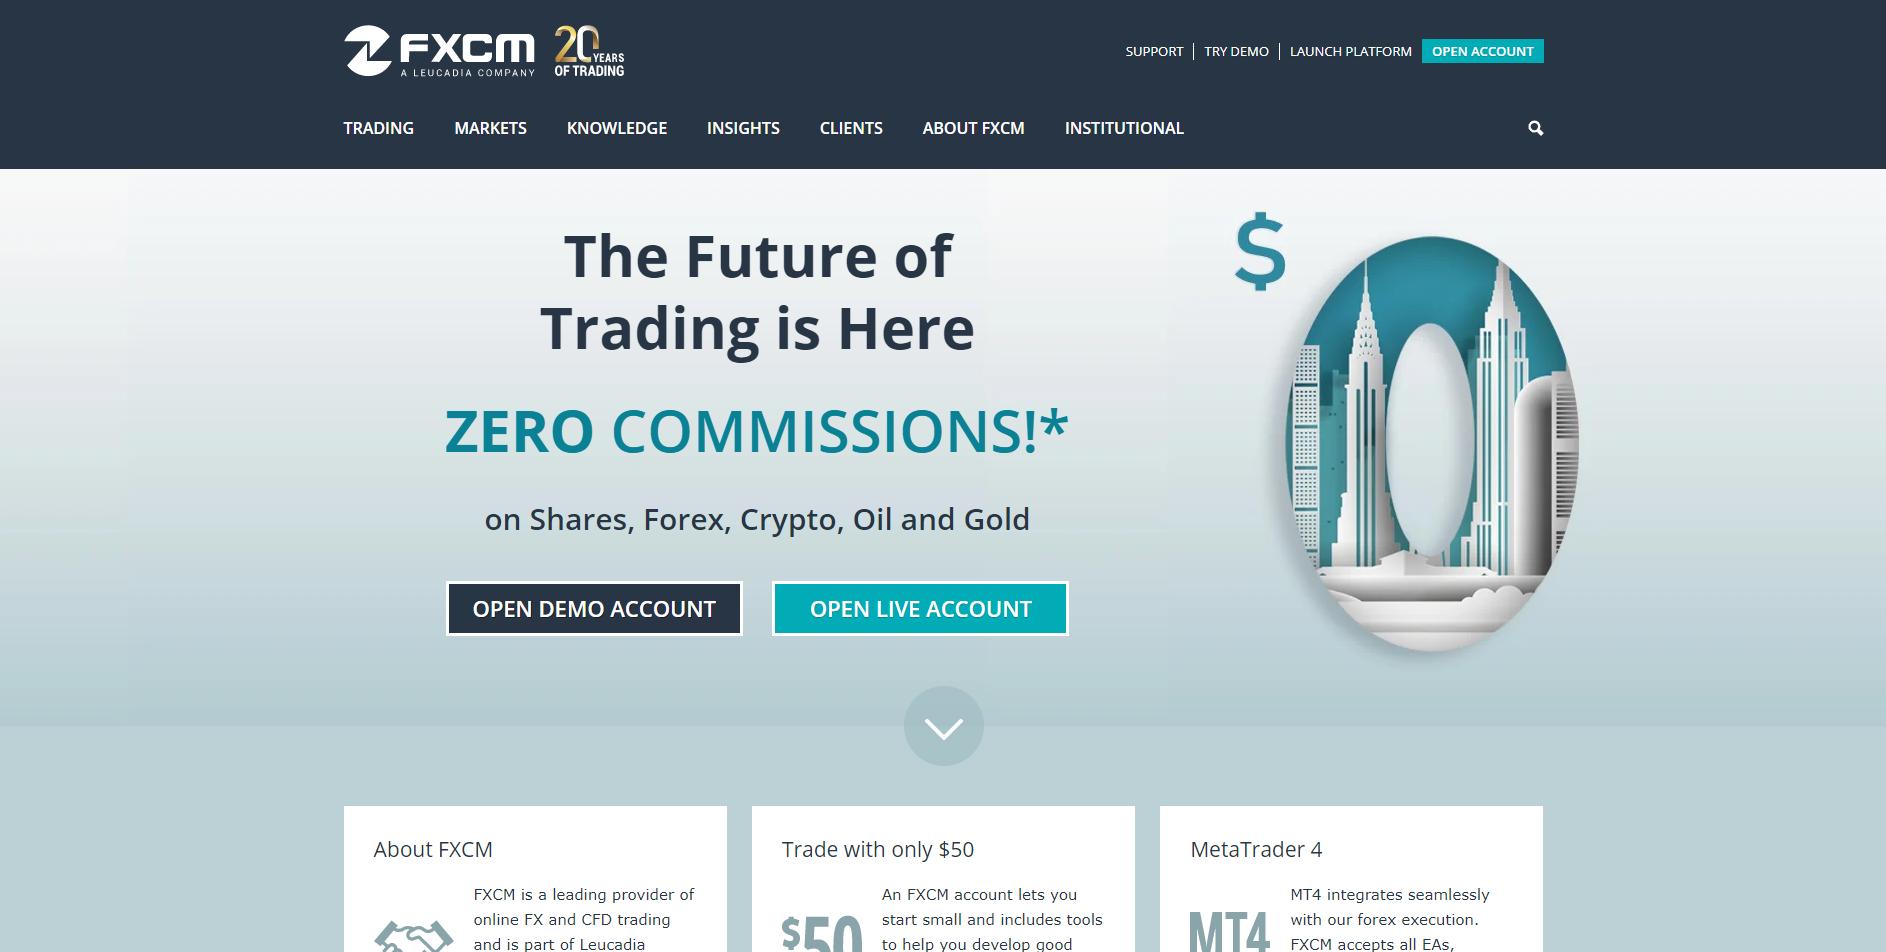 Official website of the forex platform FXCM